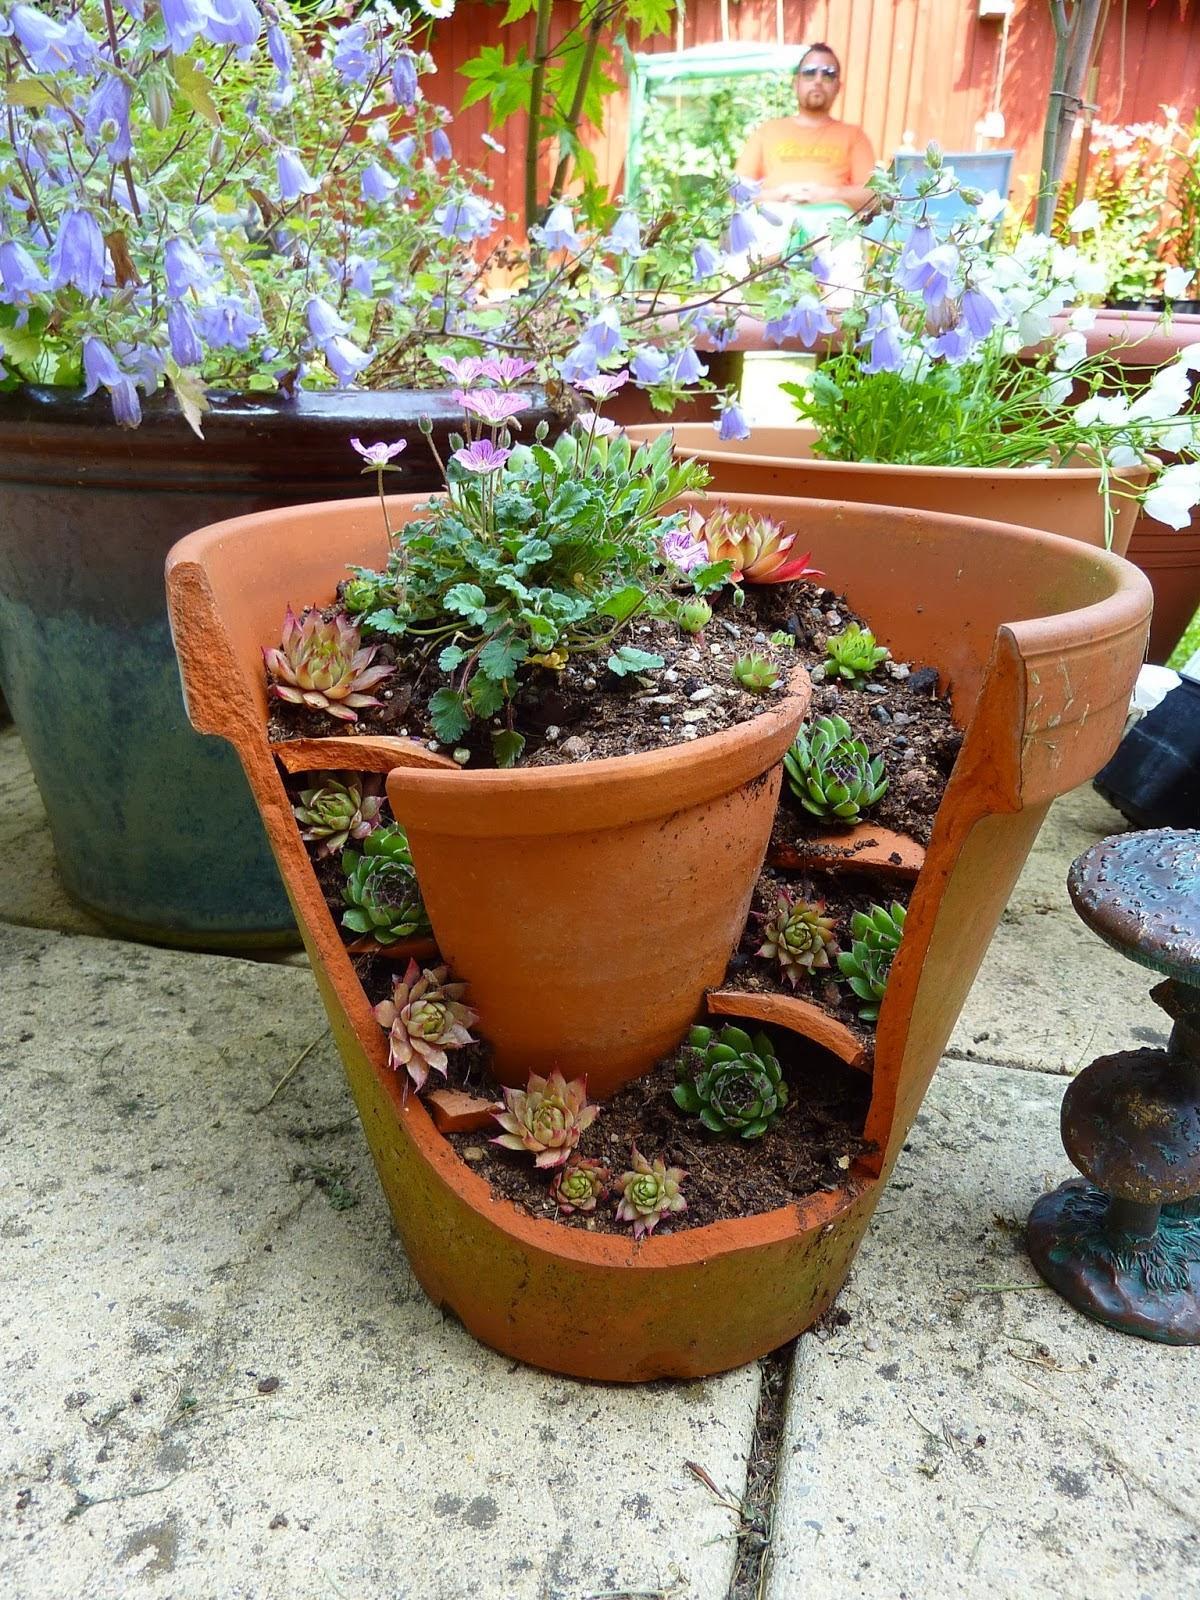 Gardening in pots ideas greenfain garden flower pots ideas workwithnaturefo